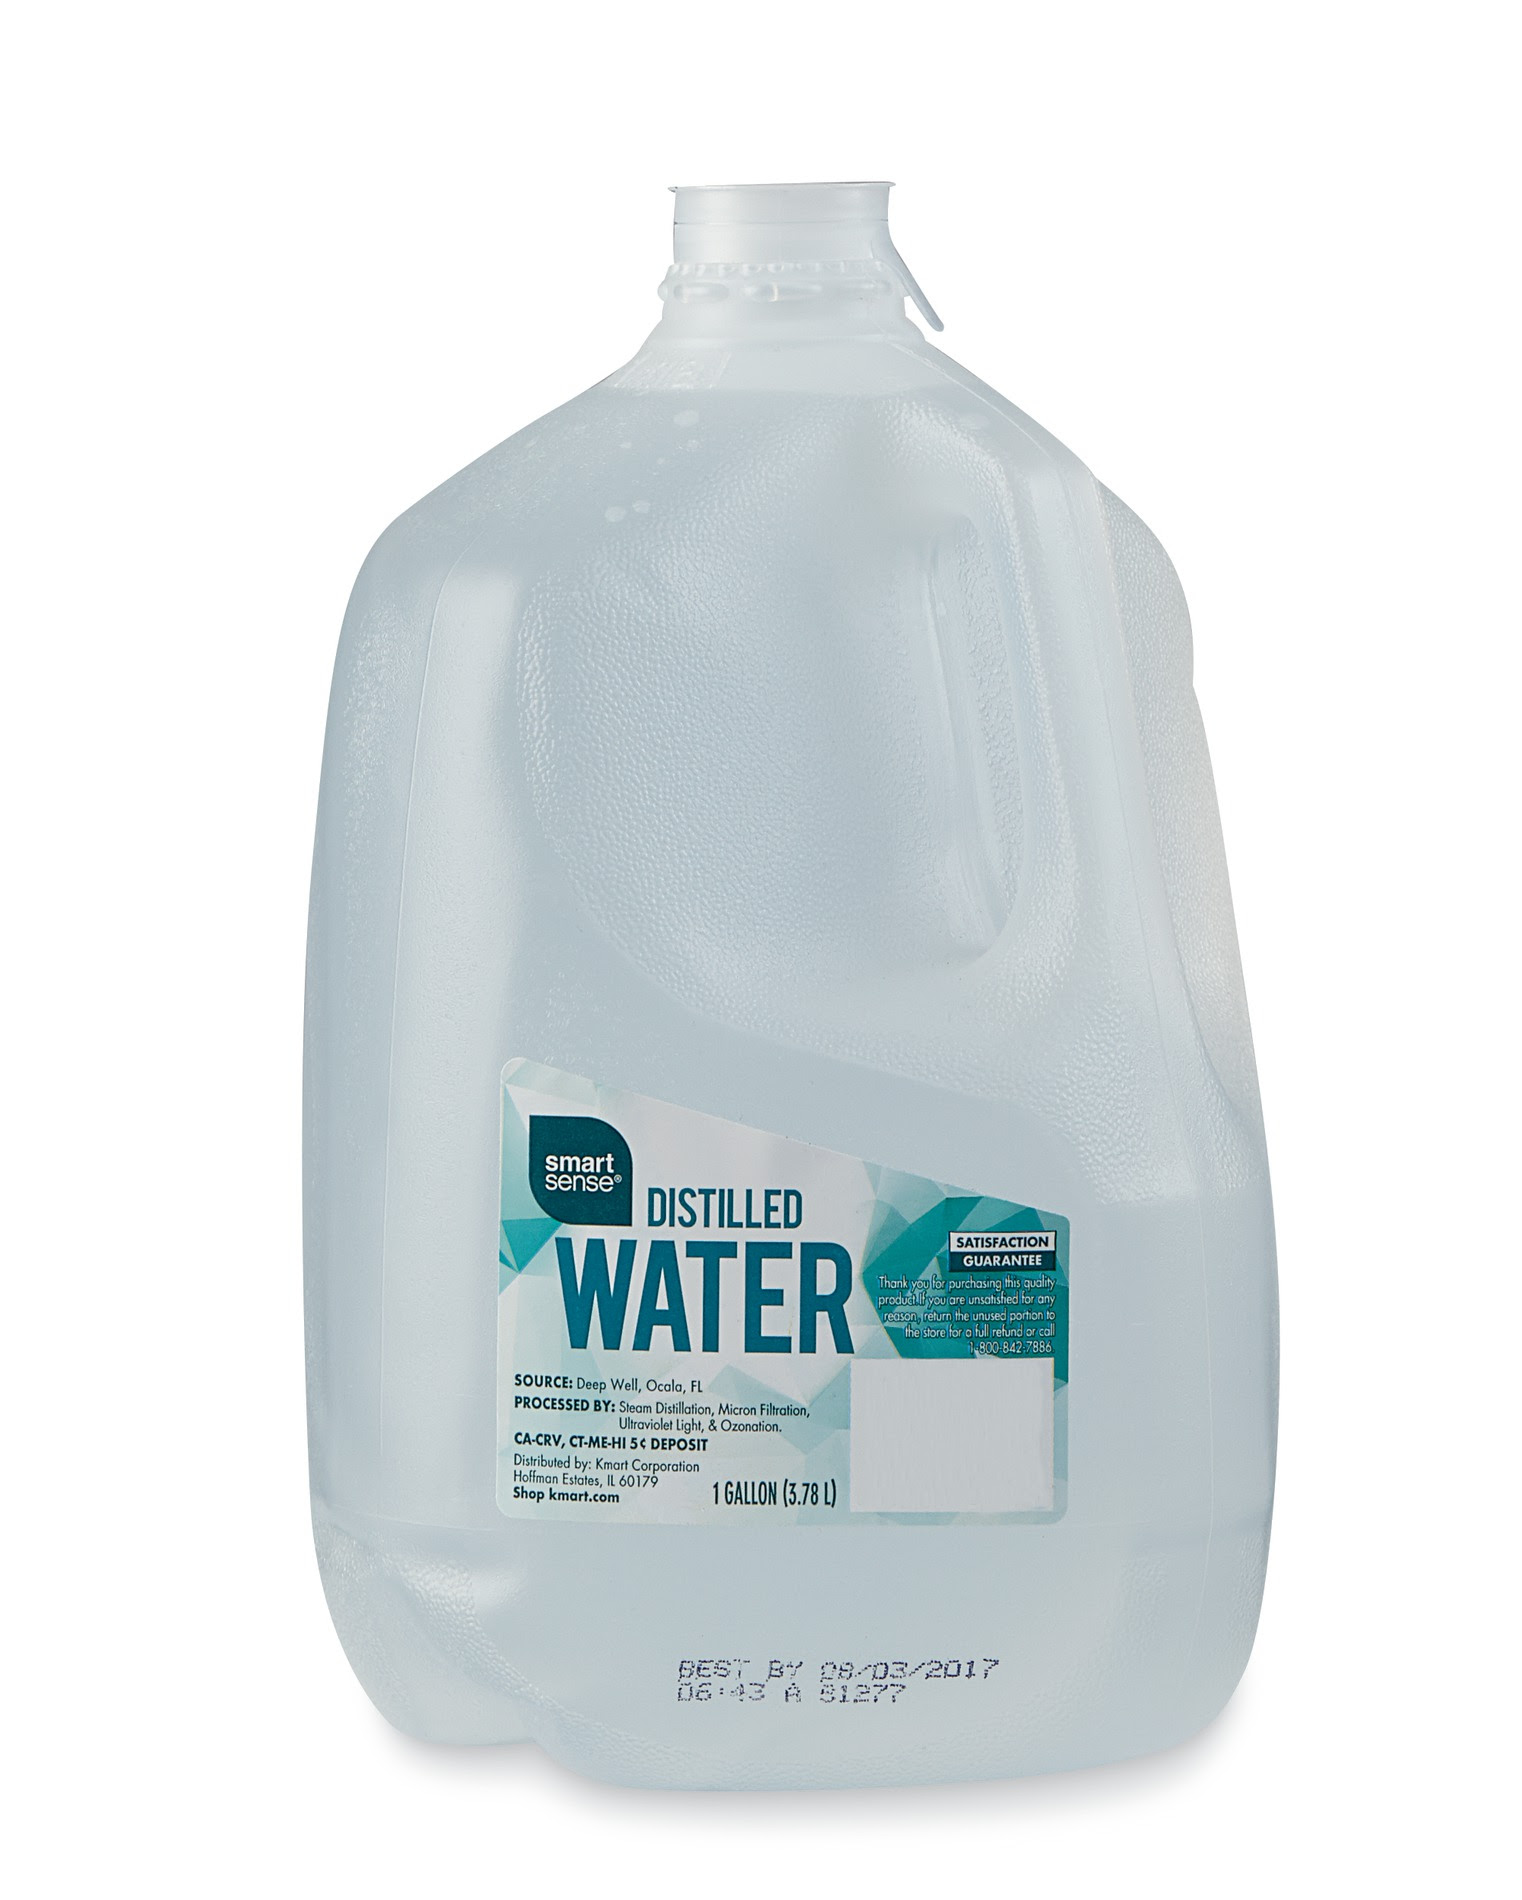 Smart Sense Distilled Water 1 Gallon Shop Your Way Online